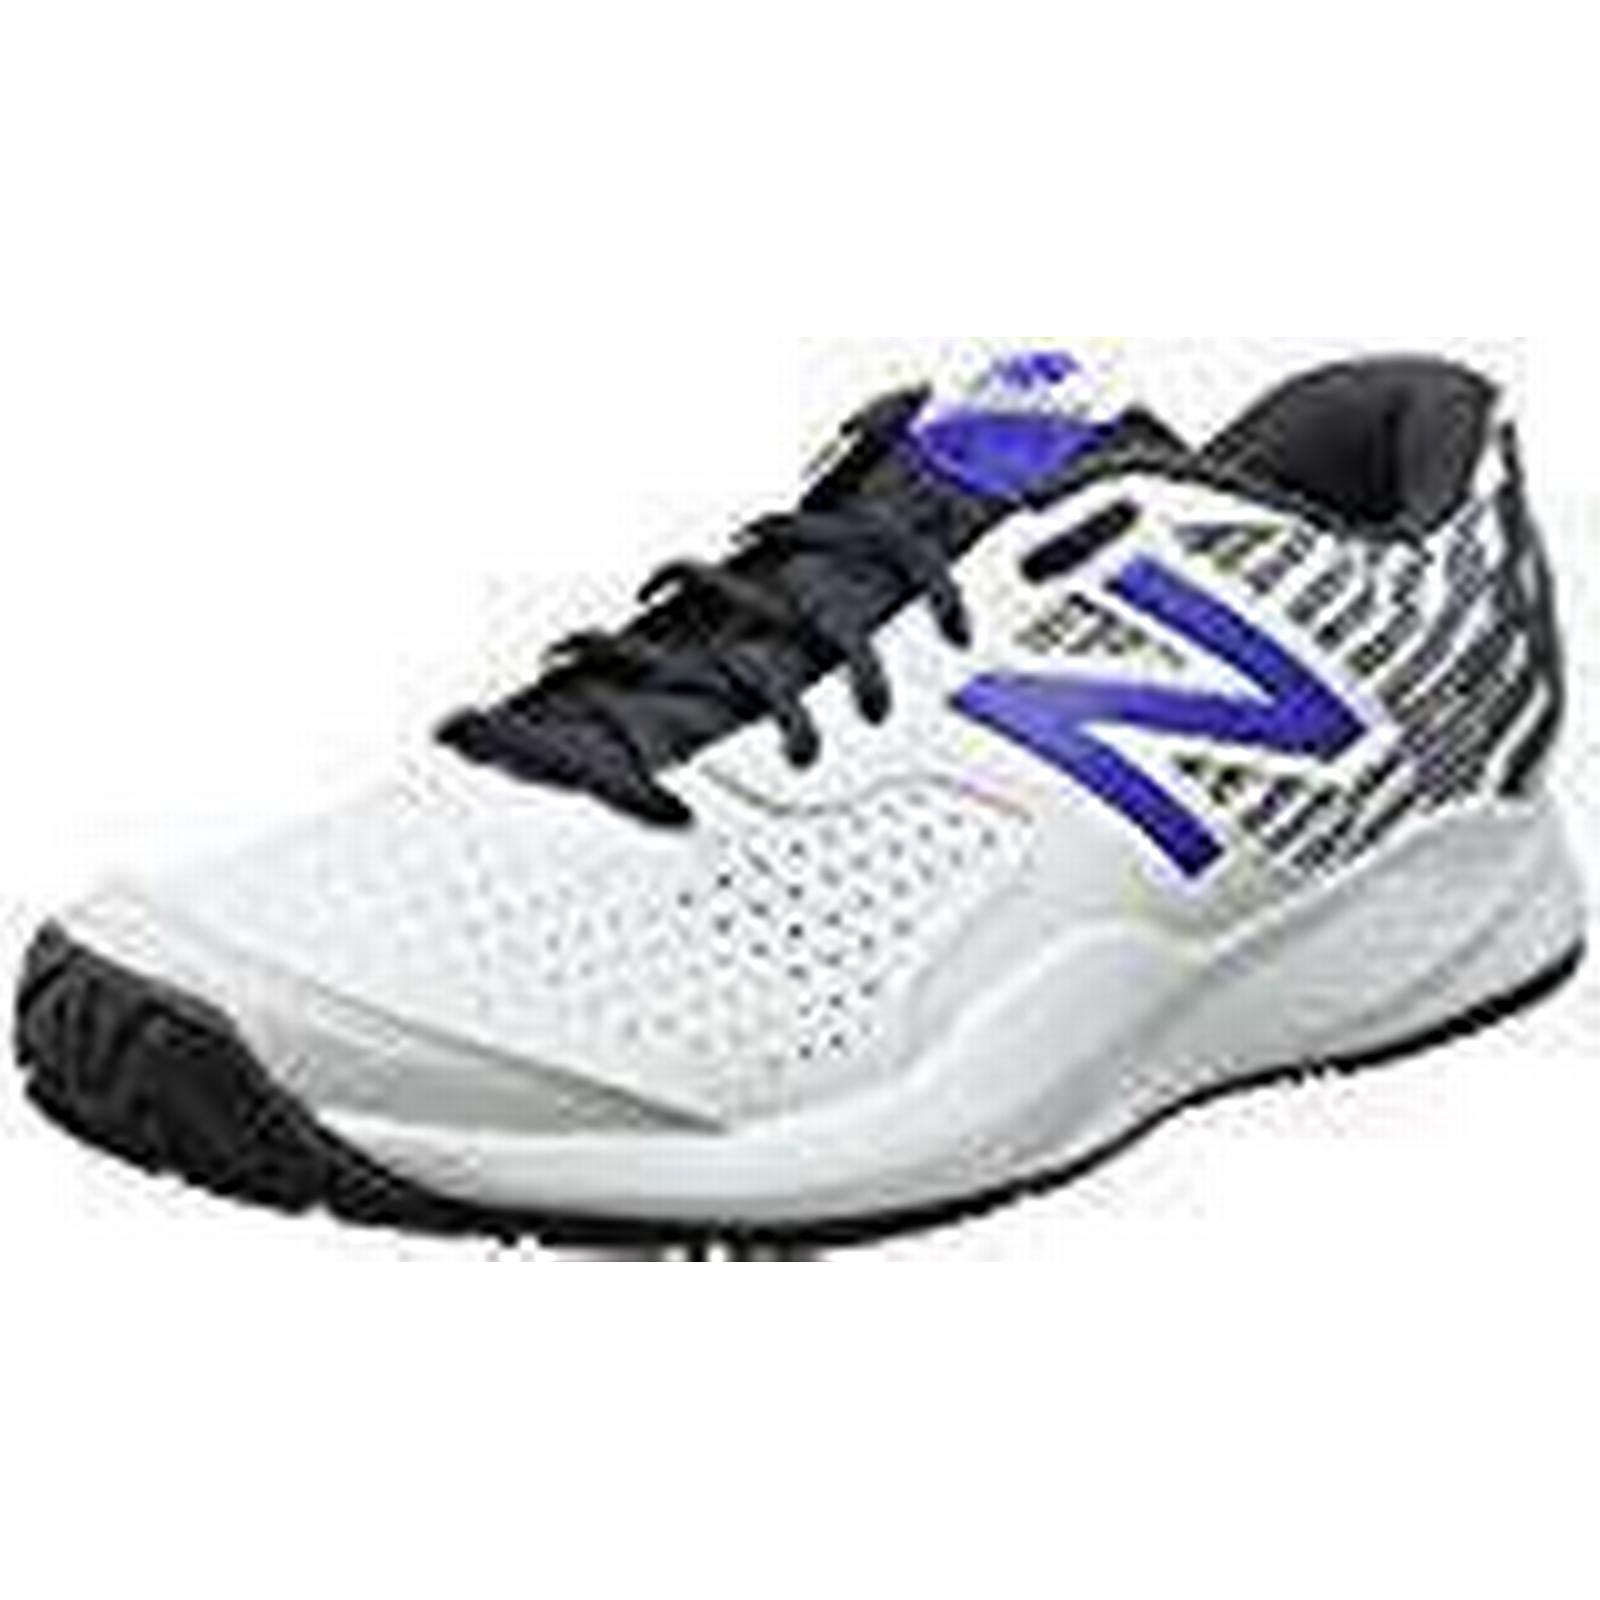 New Shoes, Balance Men's MCH696V3 Tennis Shoes, New Grey (Dark Grey), 10.5 UK 45 EU e8b20a